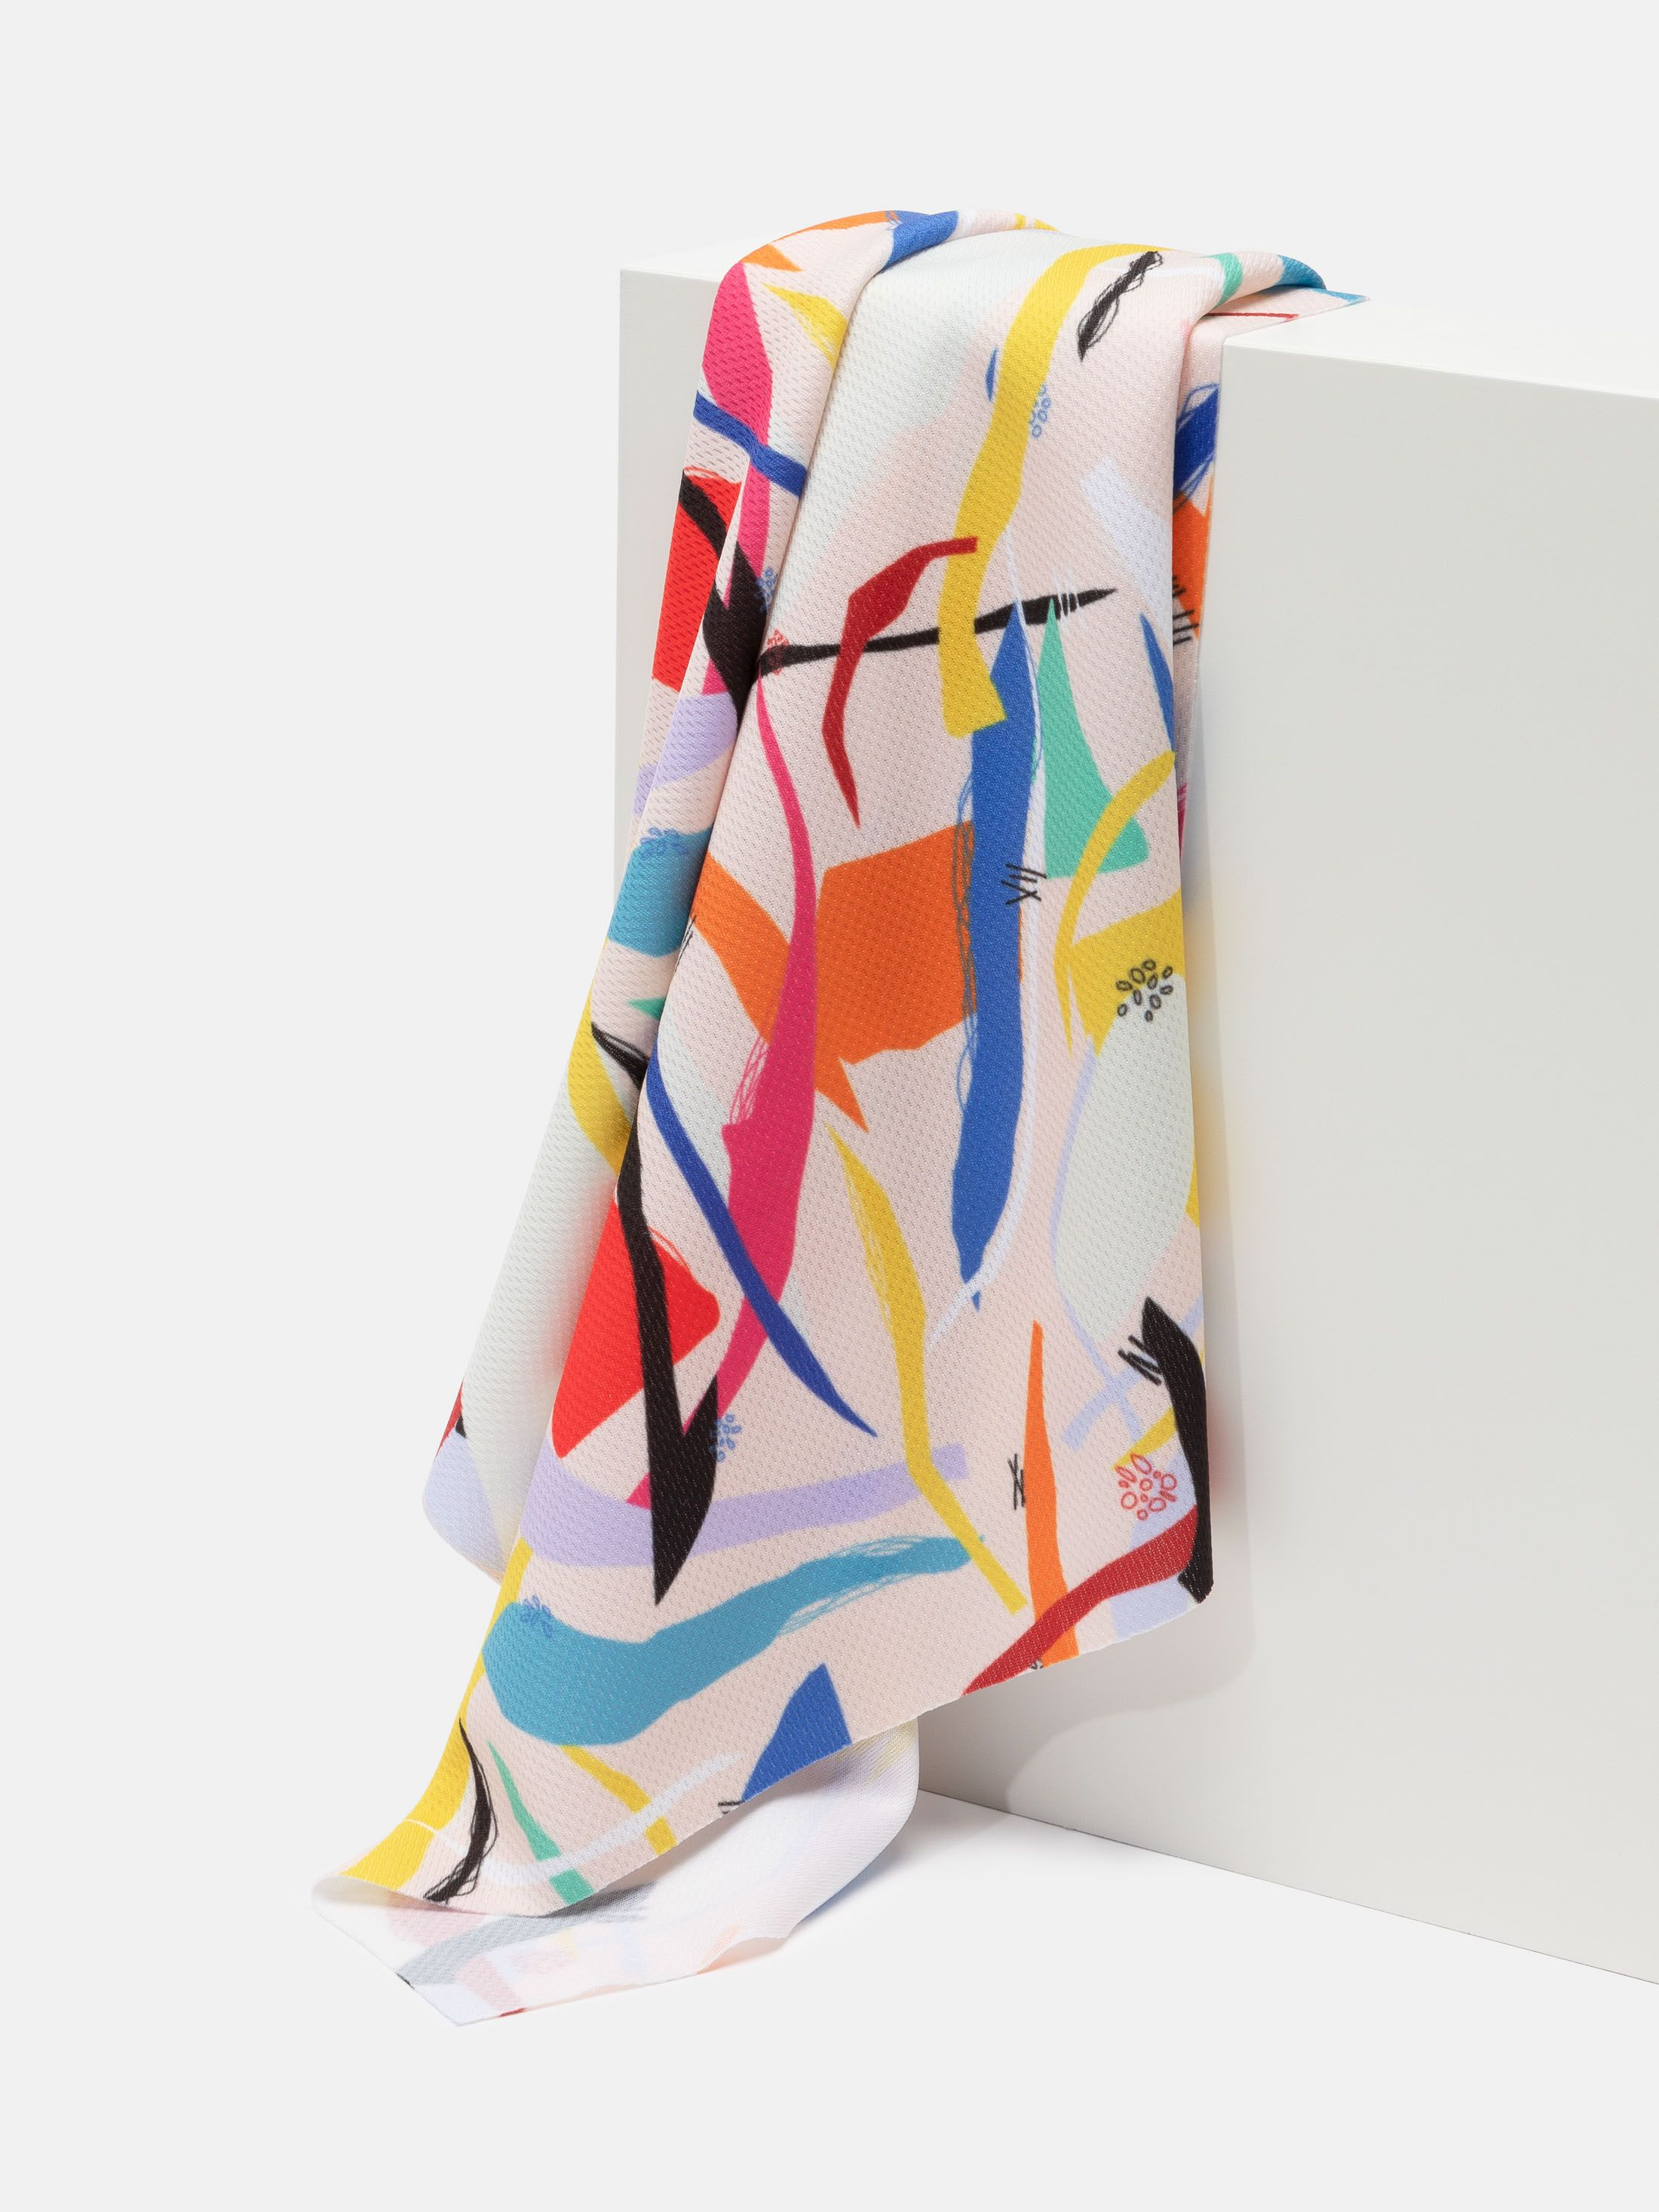 Airflow andningsbar textil